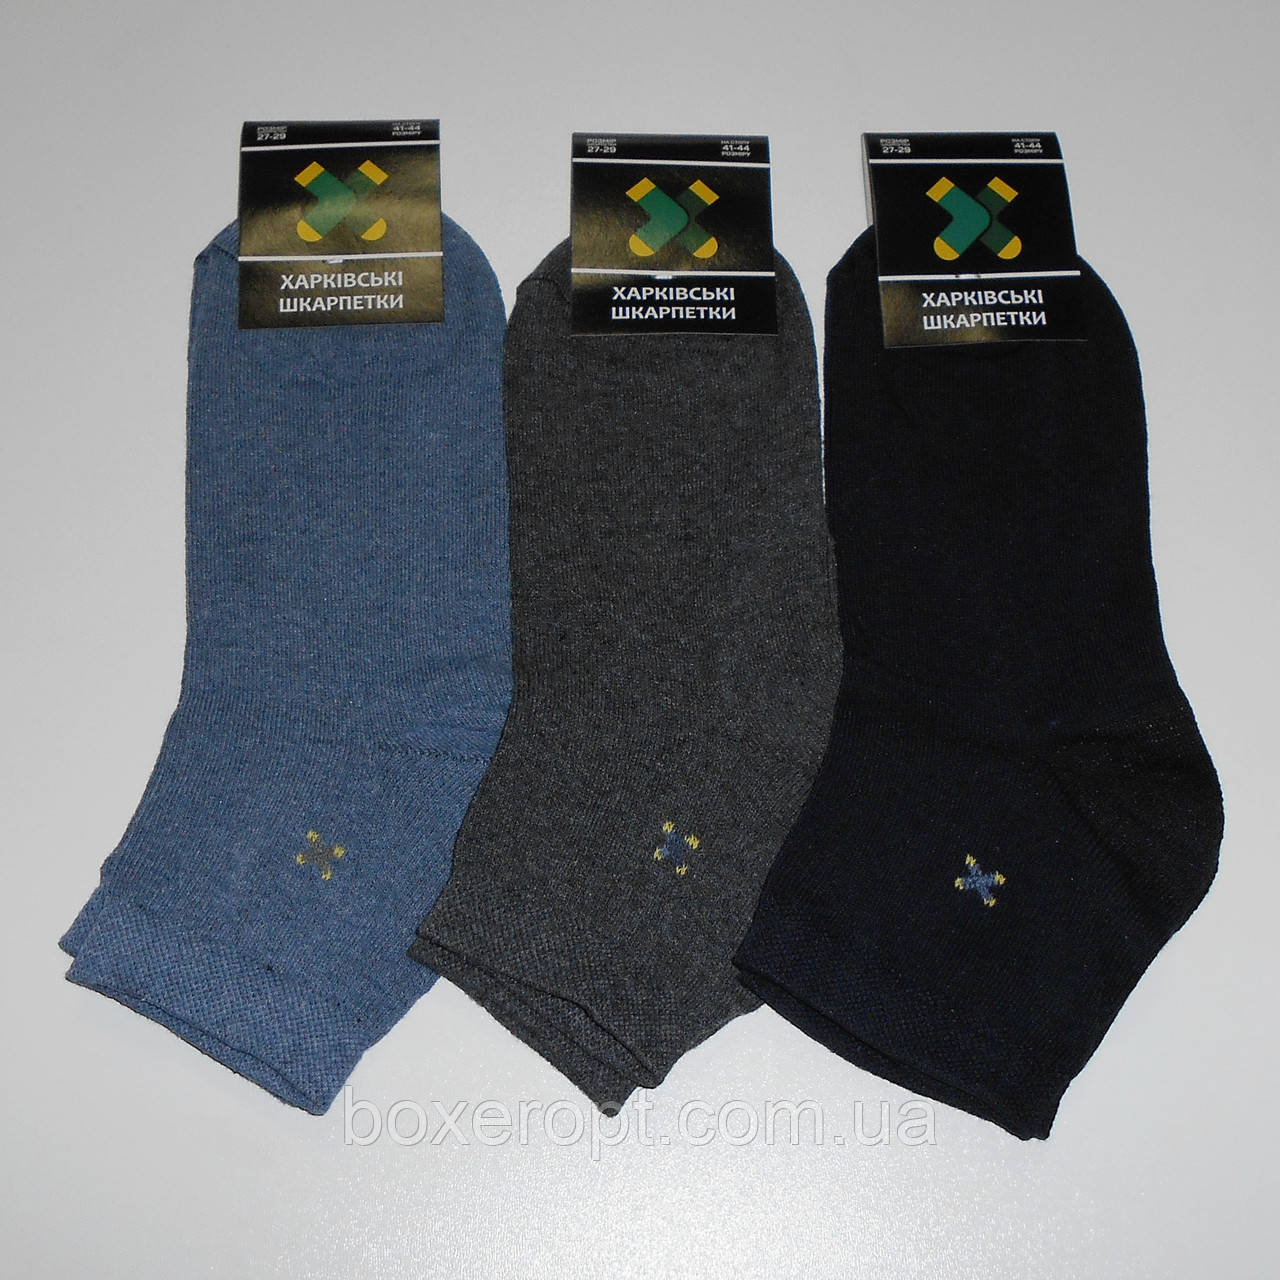 Мужские носки Comfort- 7.00 грн./пара (темное ассорти)